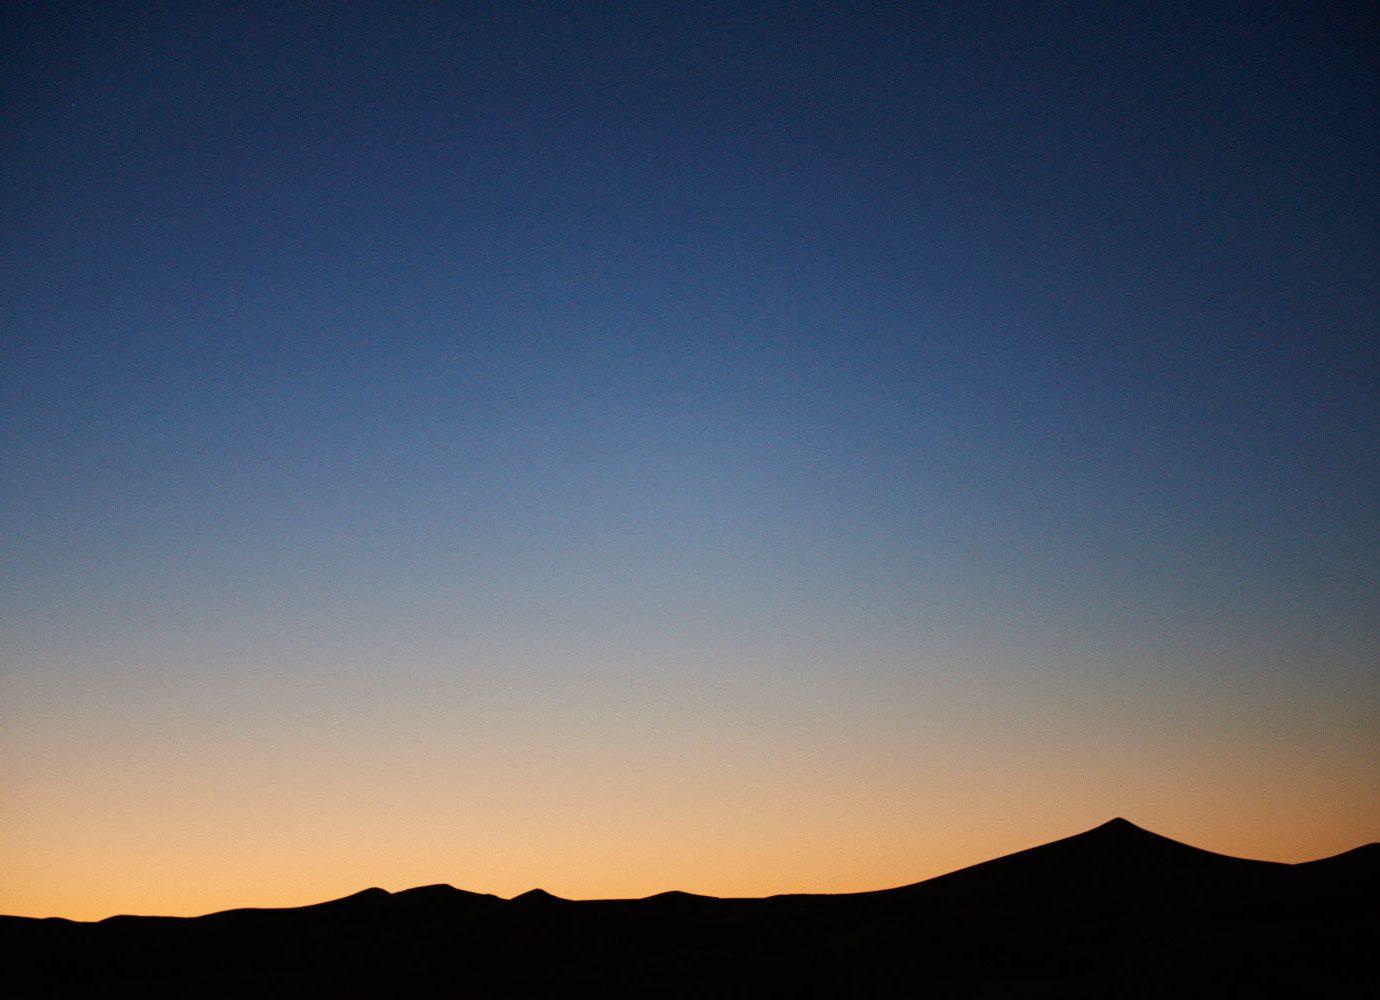 dawn Desert dusk golden hour isolation Night Sky orange sky remote sand sand dunes Sunset Trip Ideas sky outdoor horizon mountain atmosphere sunrise afterglow cloud morning evening sunlight clouds distance day highland